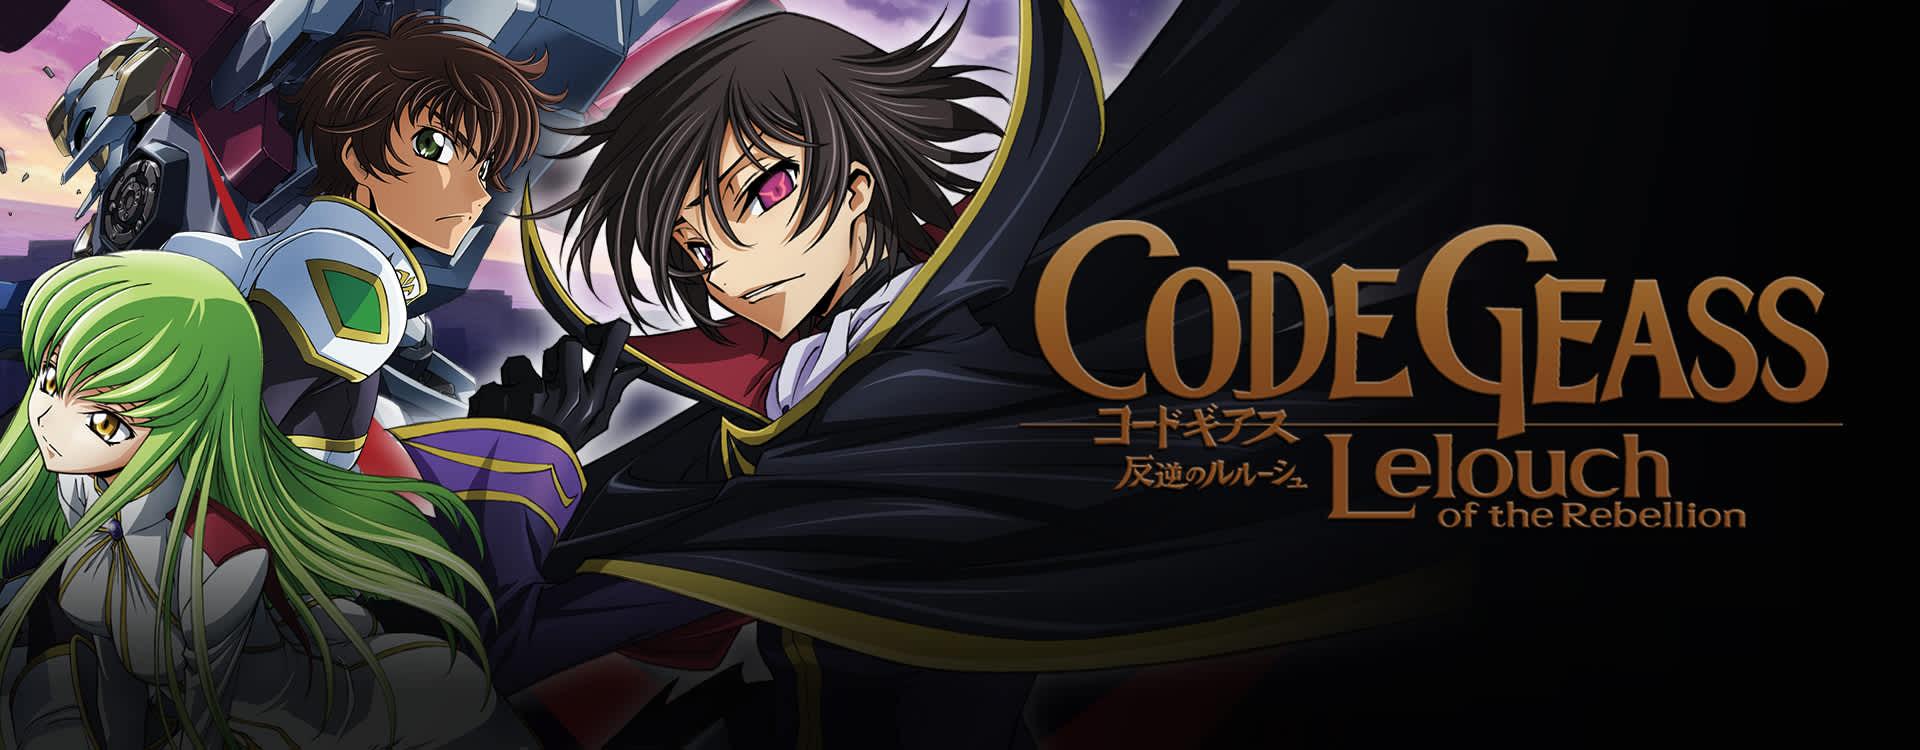 Watch Code Geass Episodes Sub & Dub | Action/Adventure, Sci Fi Anime